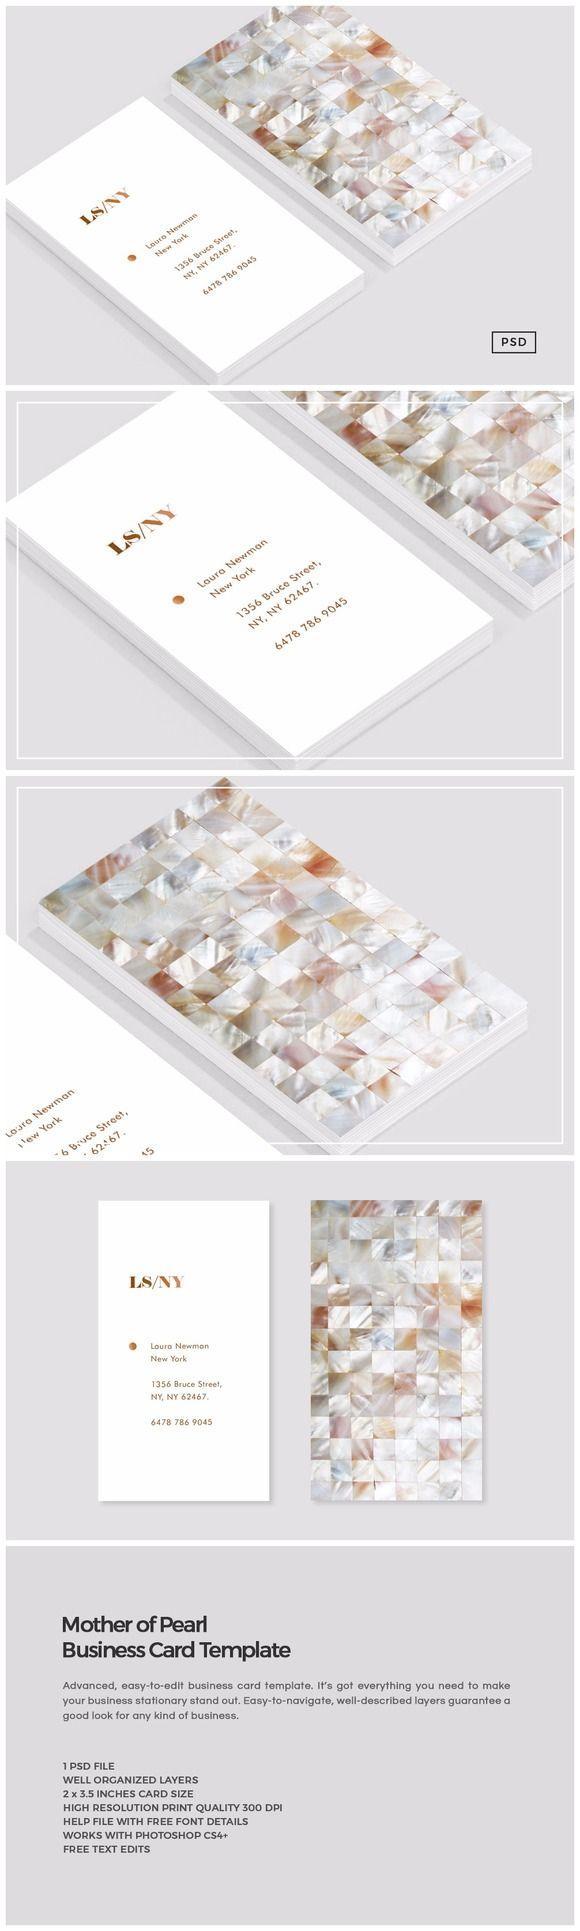 mother of pearl business card グレーのレディースファッションコーデ